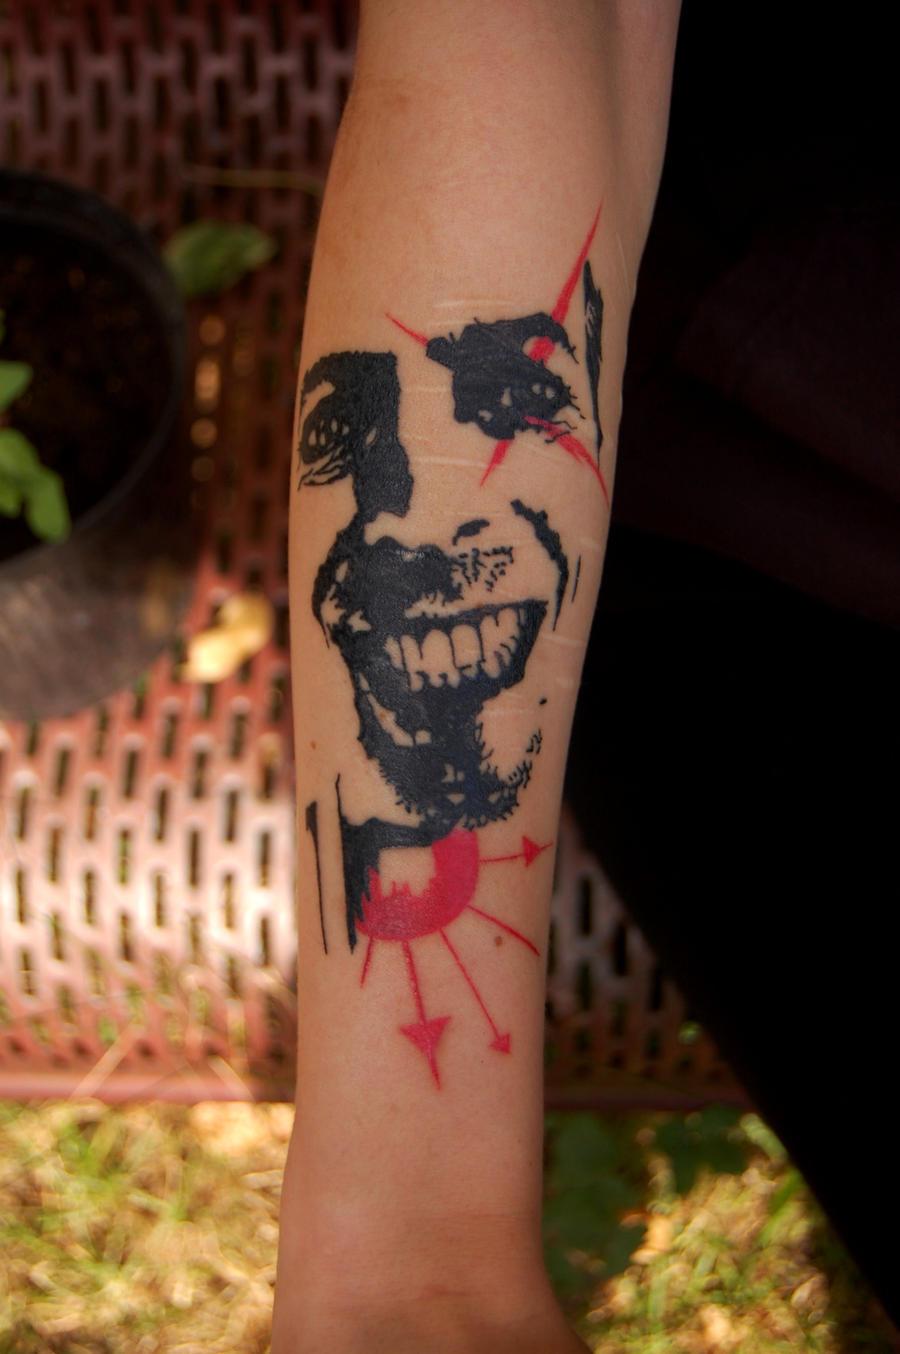 David bowie tattoo by silentplannet on deviantart for David bowie tattoos